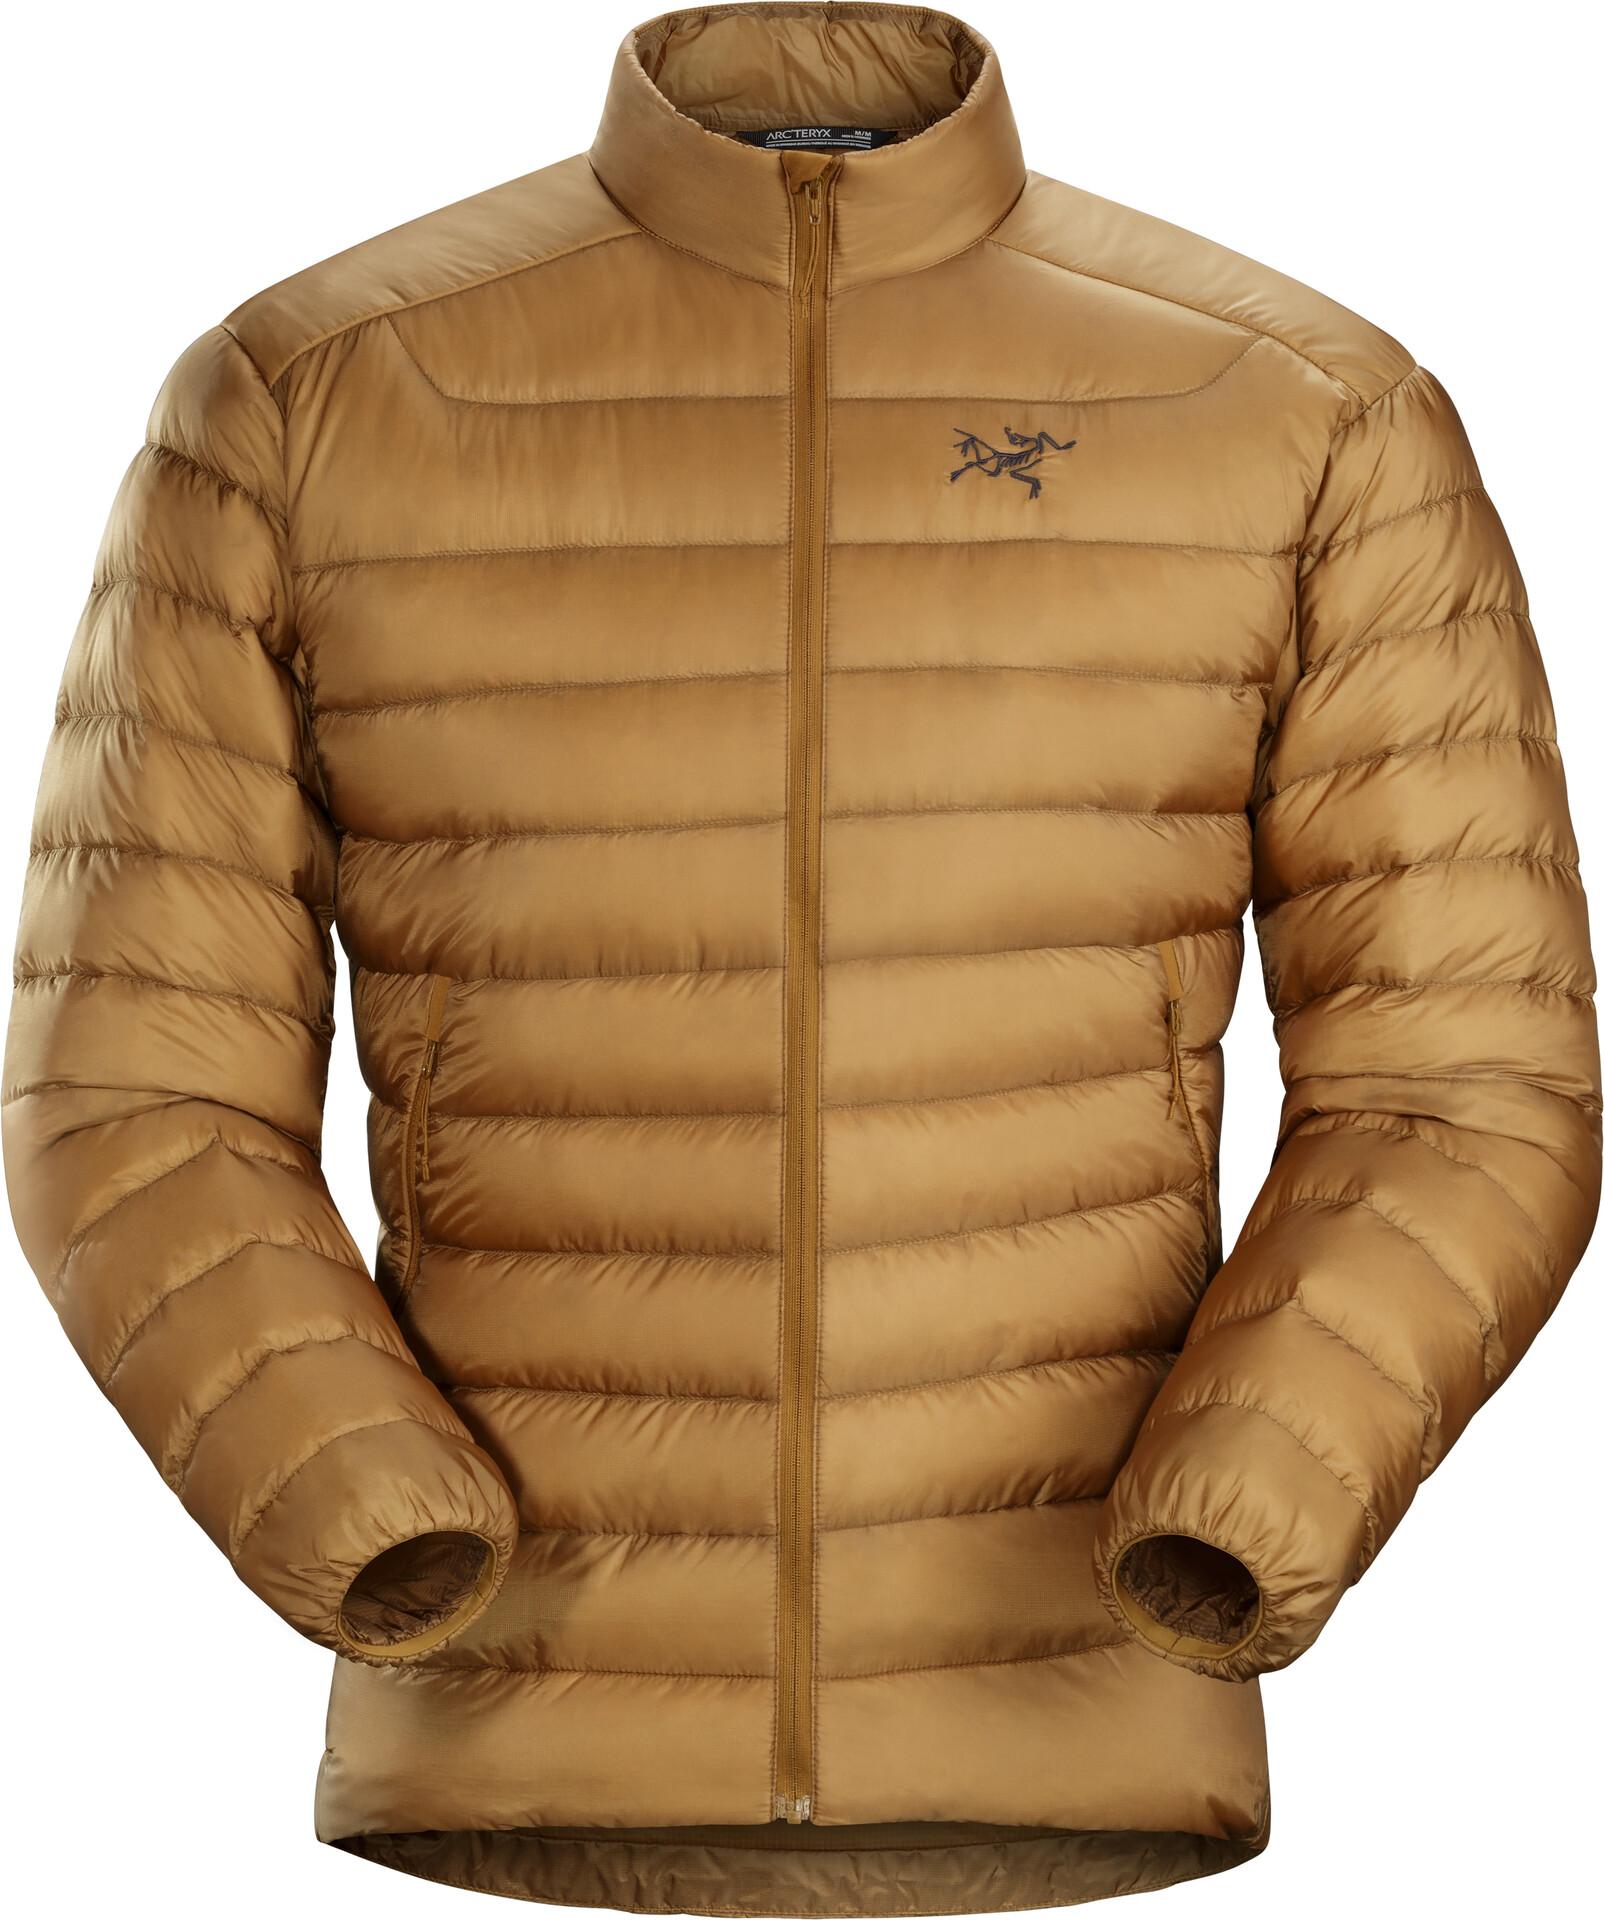 Marmot Herren Avant Featherless Hoody Ultra-leichte Isolierte Winterjacke Winddicht Warme Outdoorjacke Mit Kapuze Wasserabweisend